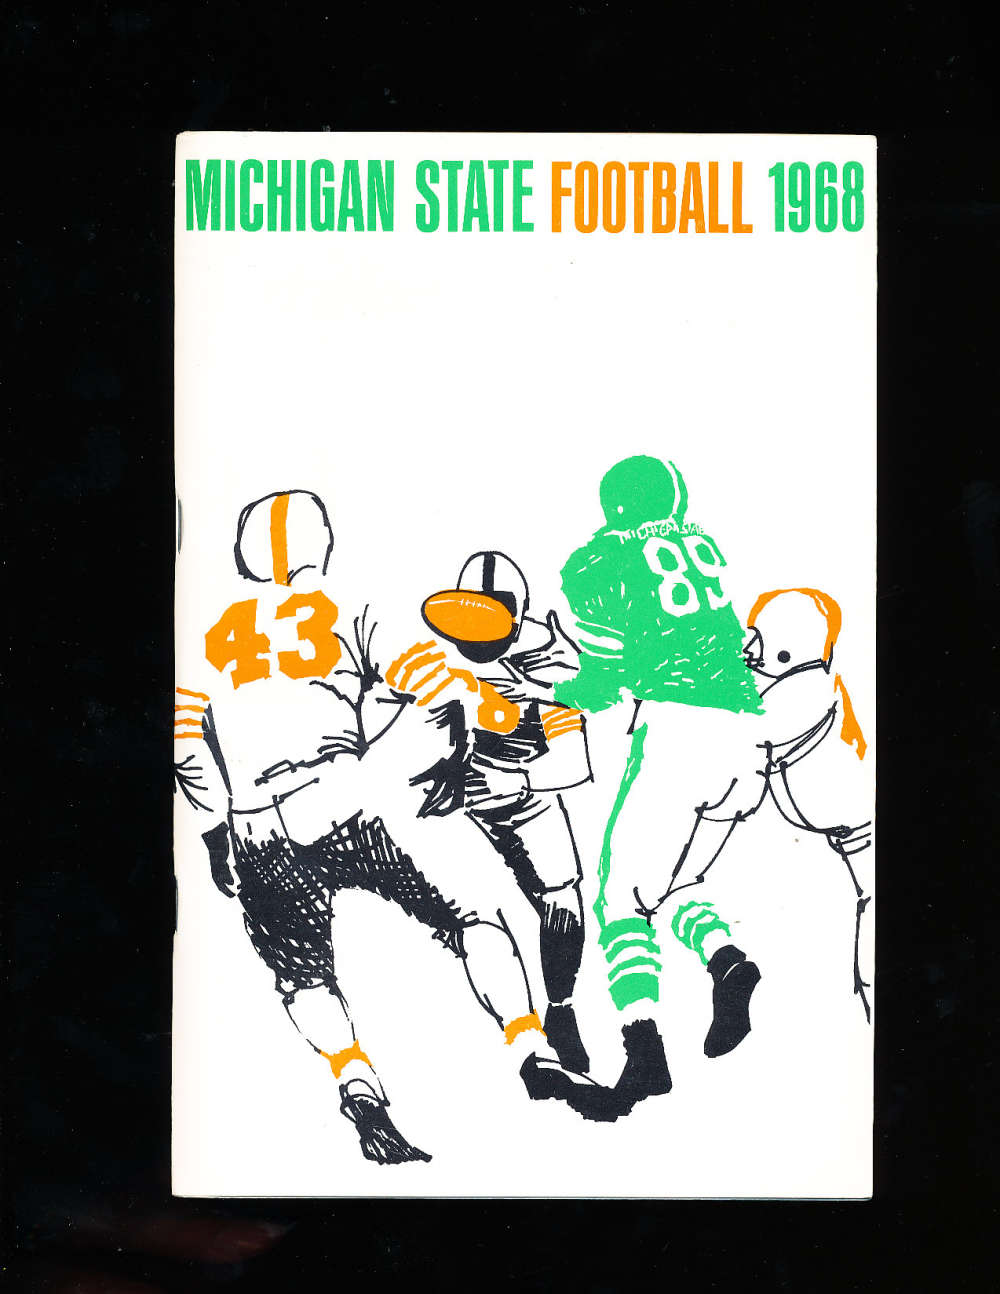 1968 Michigan state Football Media Press Guide